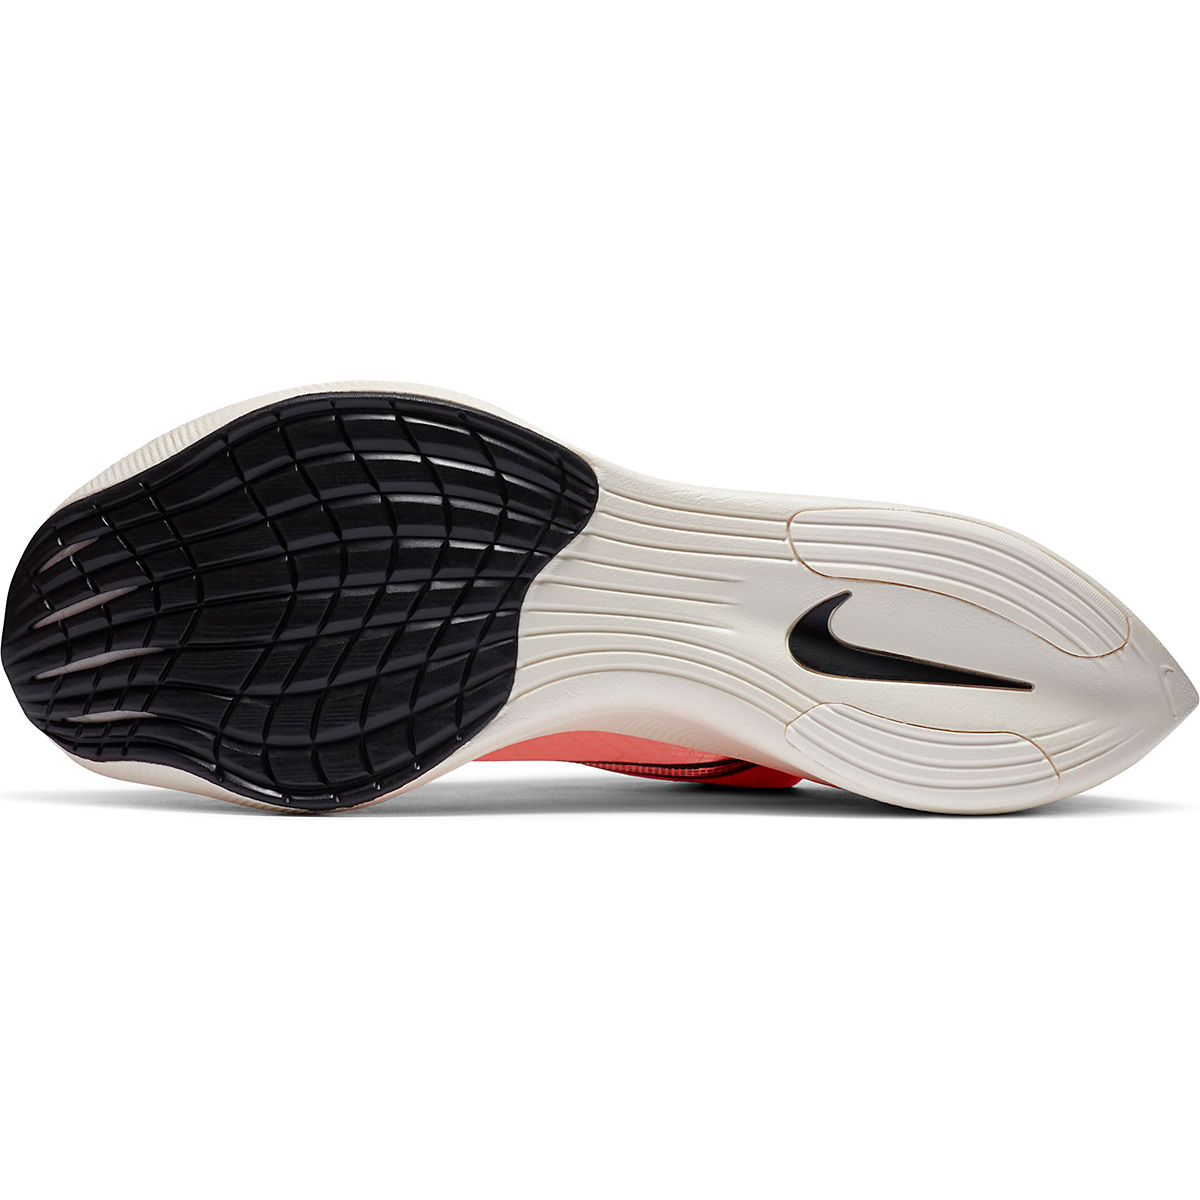 Nike ZoomX Vaporfly NEXT% Running Shoe - Color: Bright Mango/Citron Pulse - Size: M3.5/W5 - Width: Regular, Bright Mango/Citron Pulse, large, image 5